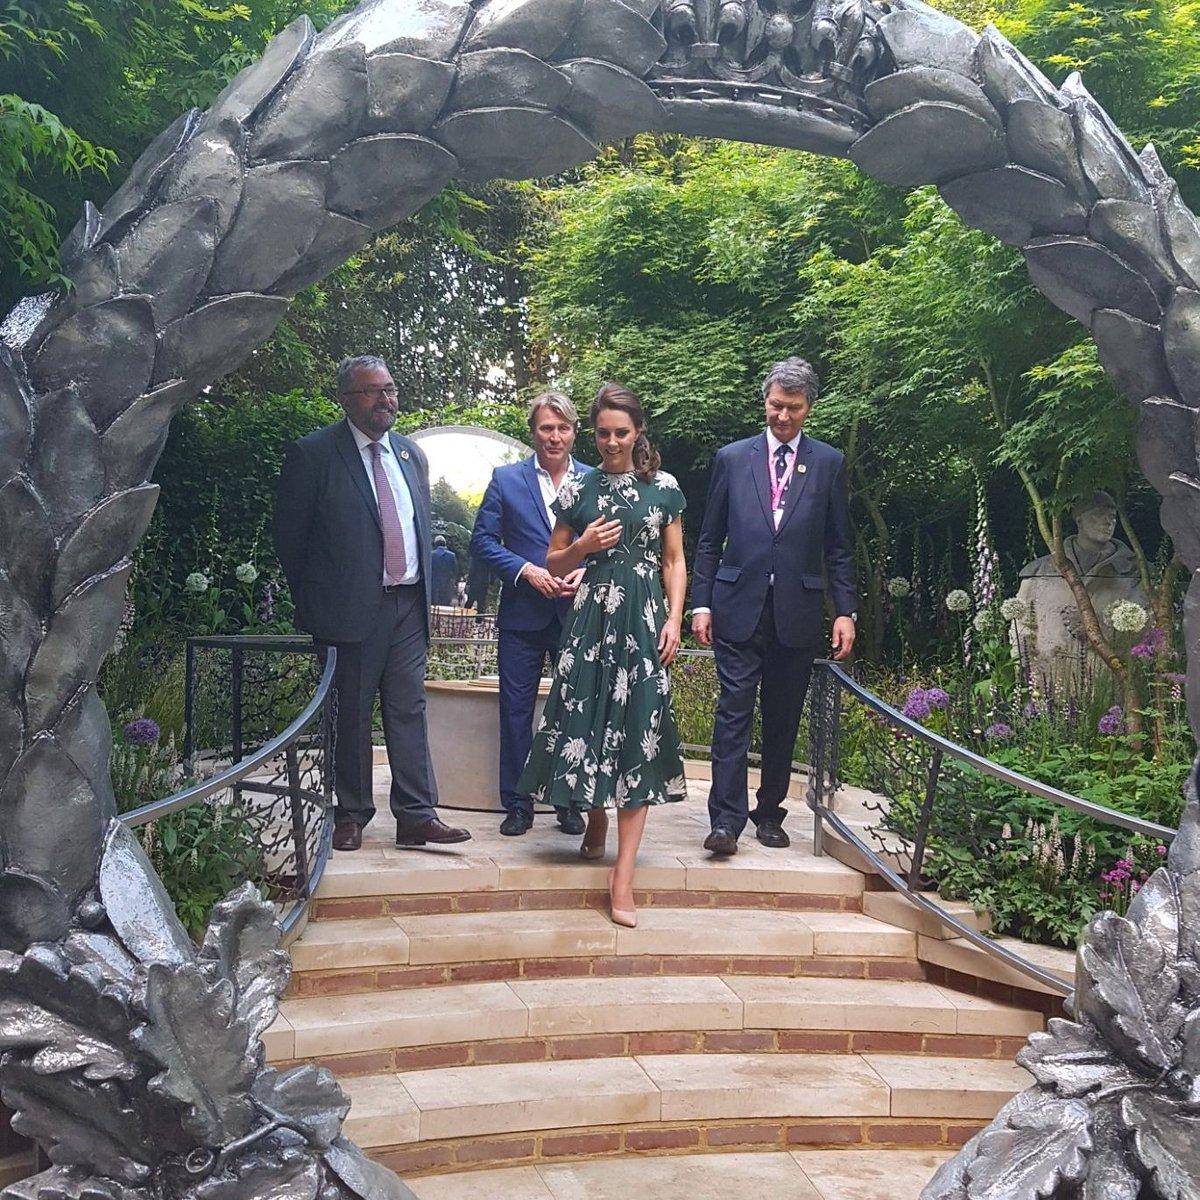 The Royal Family Royalfamily Twitter